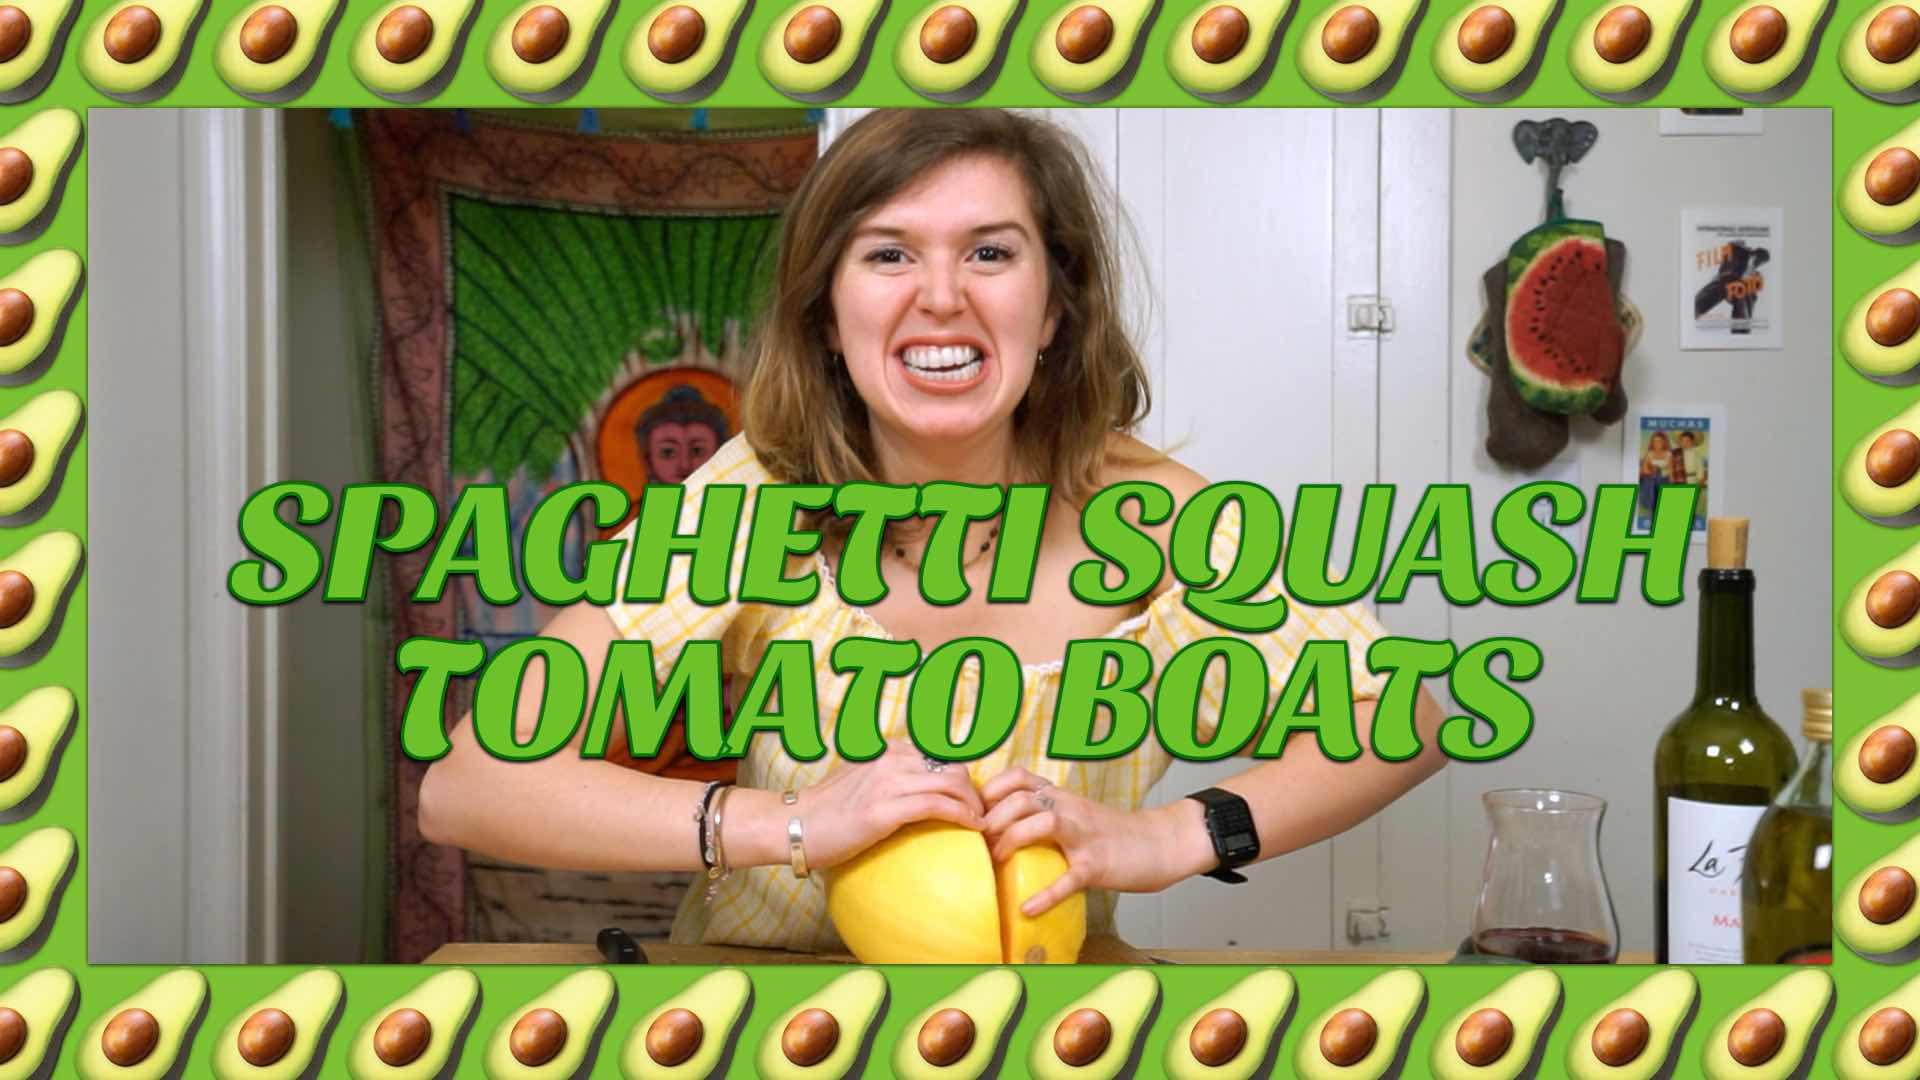 How to Make Vegan Spaghetti Squash & Tomato Sauce Boats with Avocadamama